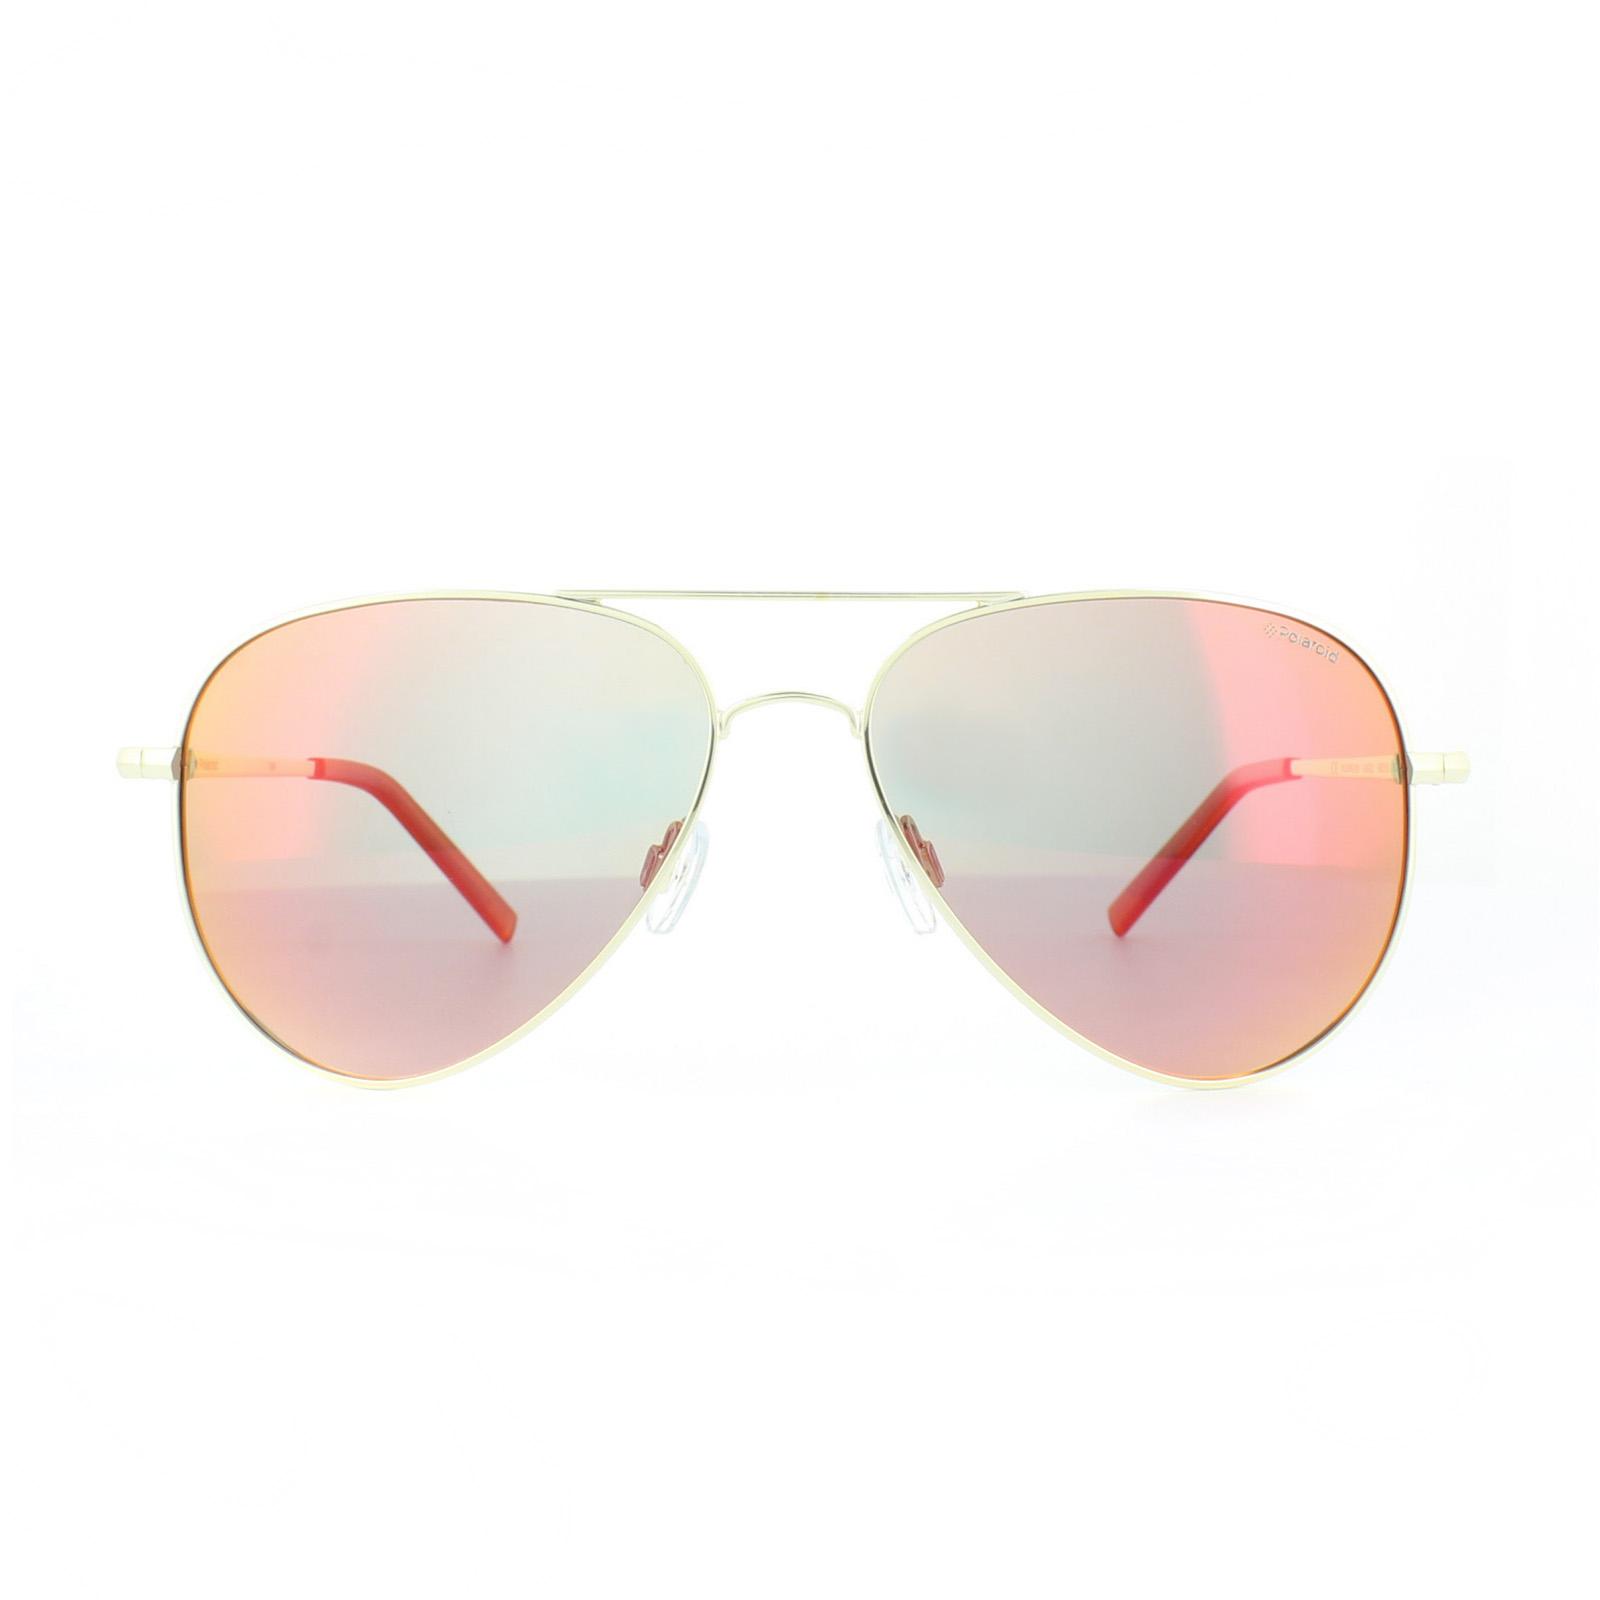 Sentinel Polaroid Sunglasses PLD 6012 N J5G OZ Gold Red Mirror Polarized 3d1eedb25d79